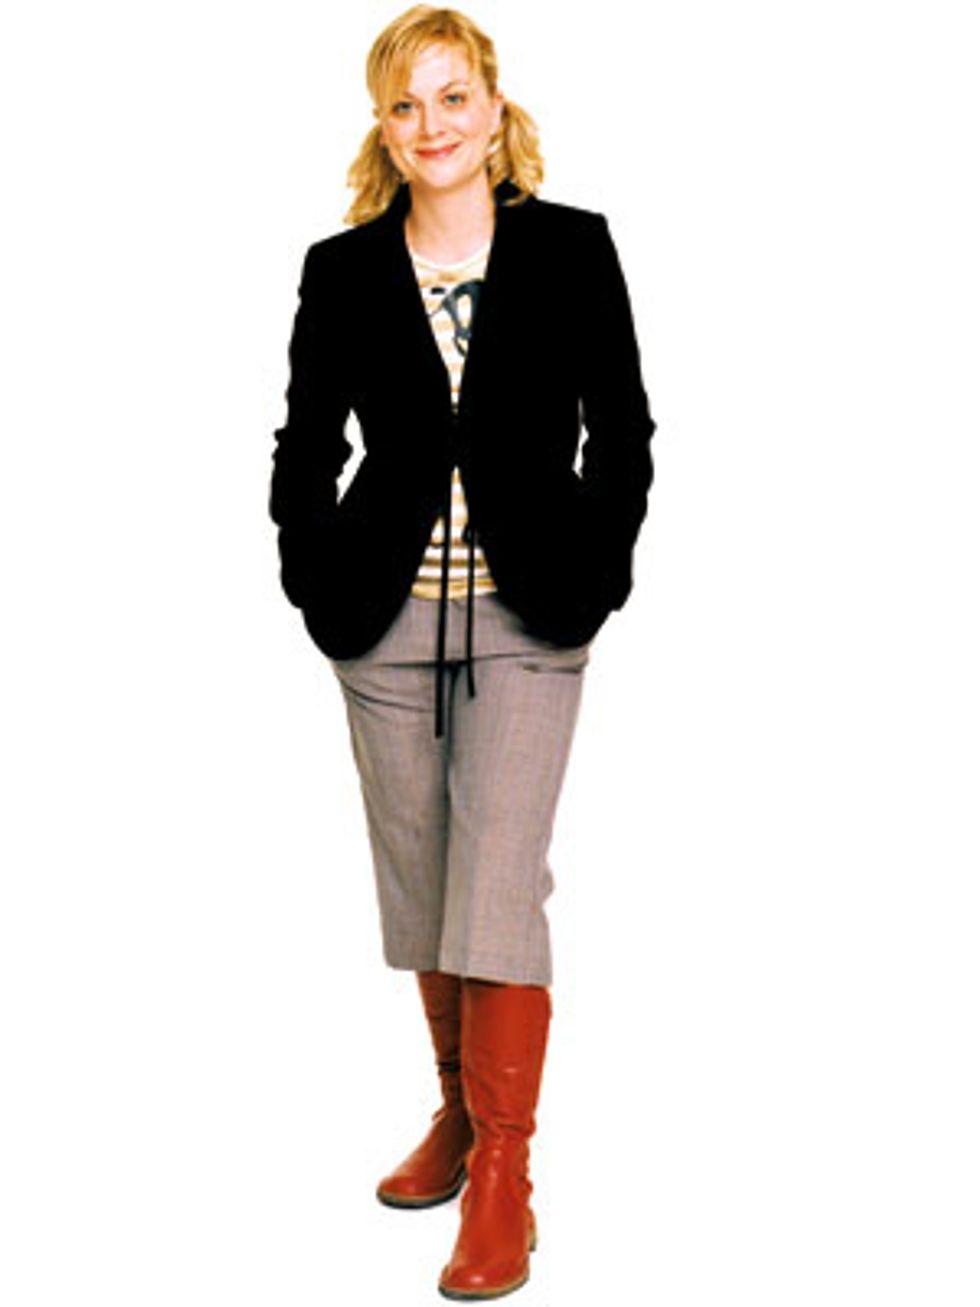 Beautiful People 2003: Amy Poehler